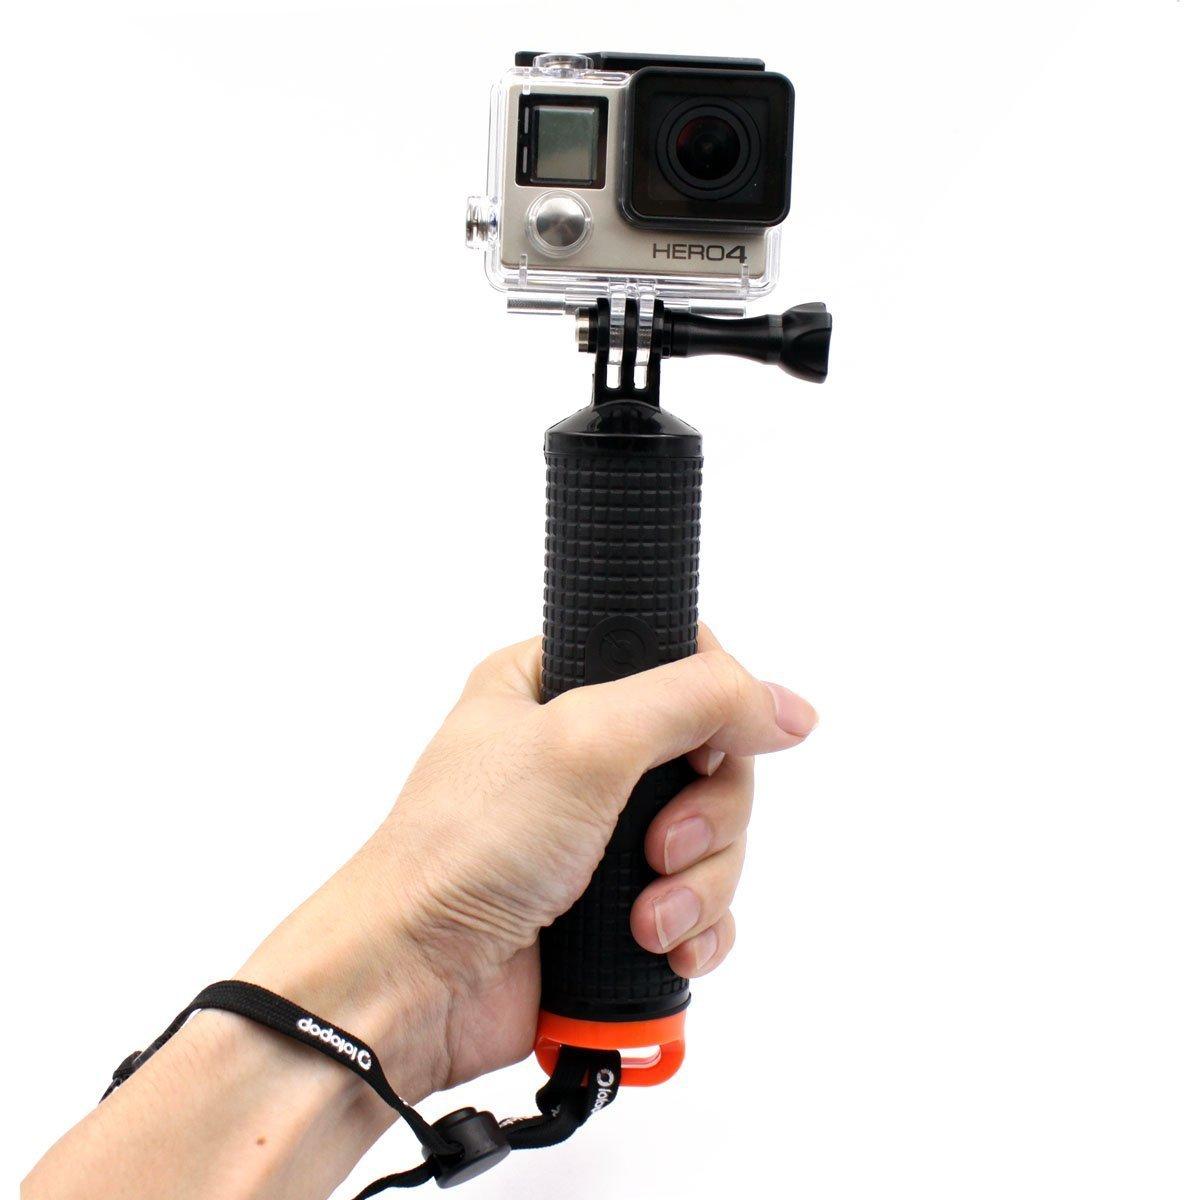 ... ftung GoPro mando, flotador notebook Float accesorios de mano mango grip handle + Tornillo + Muñeca Correa para GoPro Hero 2/3/3 +/4 Sport Action Camera ...